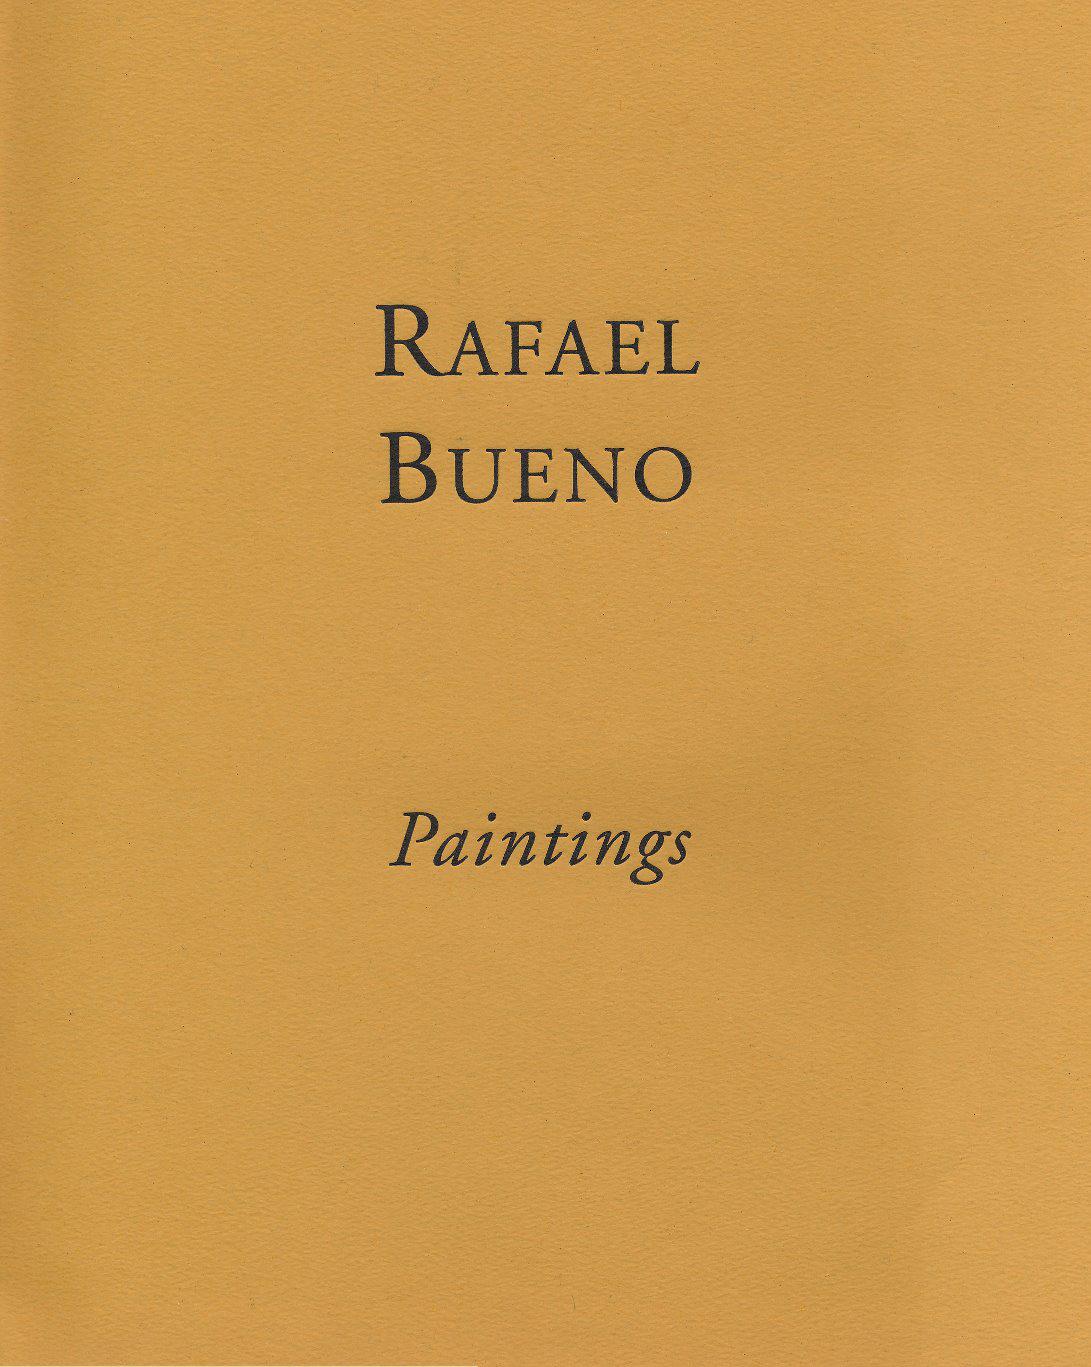 Rafael Bueno, Paintings, Centro Cultural Recoleta, Buenos Aires, 1994